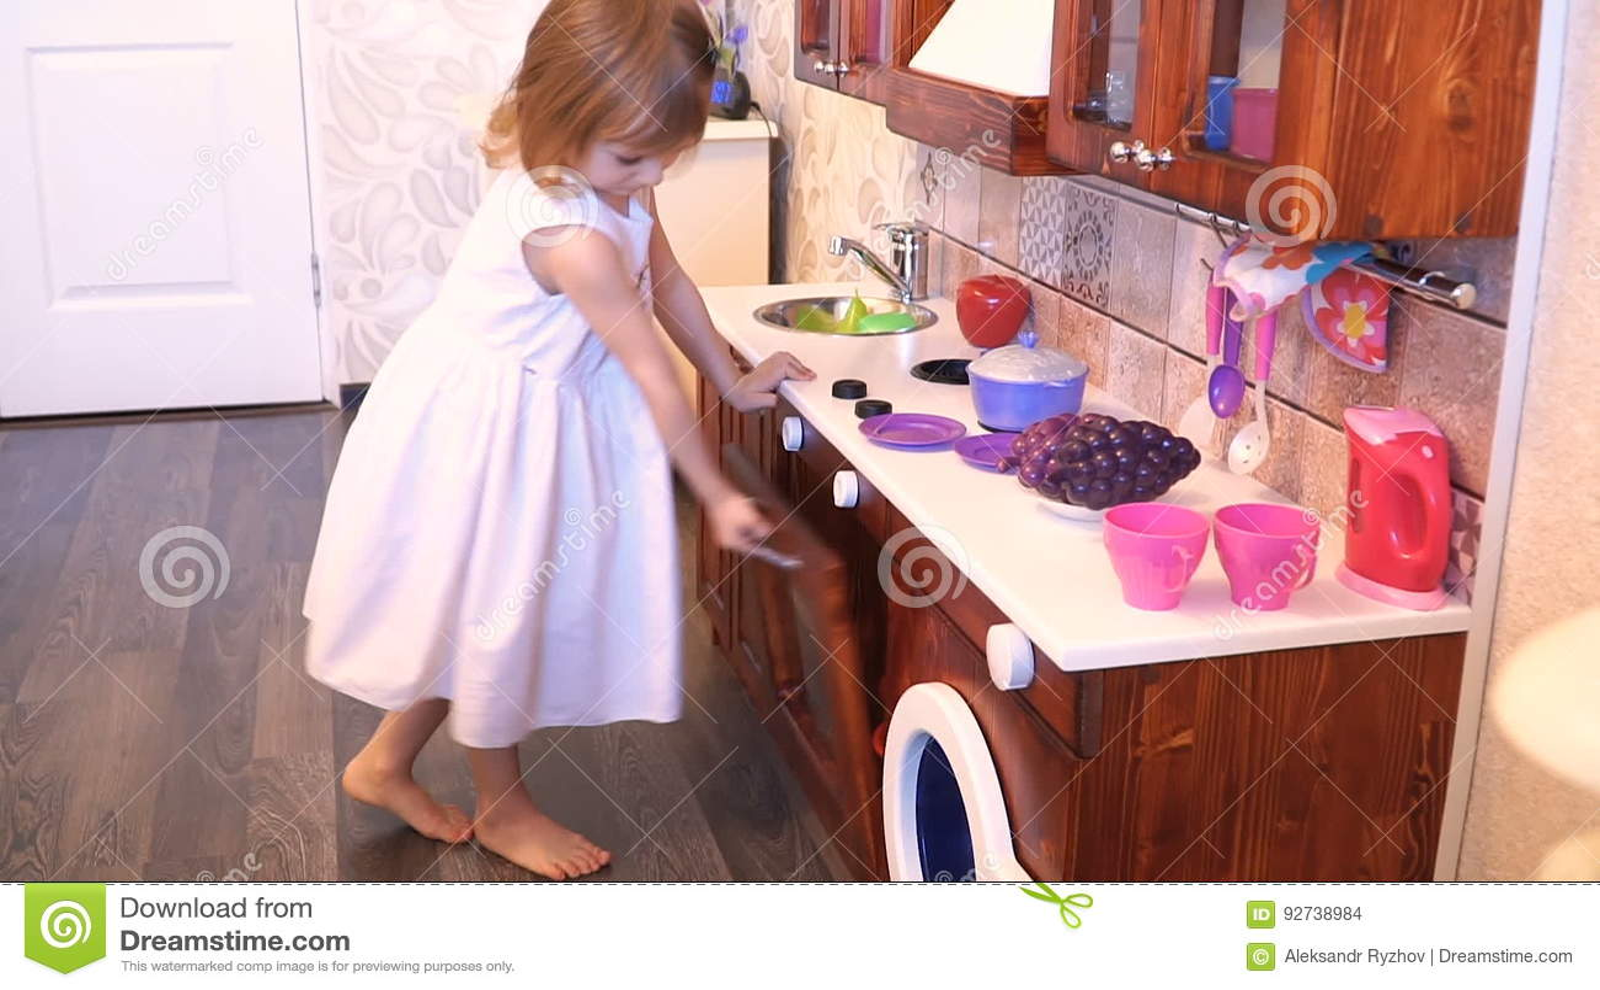 kids wood kitchen best flooring 活跃矮小的学龄前年龄孩子 有白肤金发的卷发的逗人喜爱的小孩女孩 显示 显示演奏厨房 由木头制成 戏剧影视素材 视频包括有